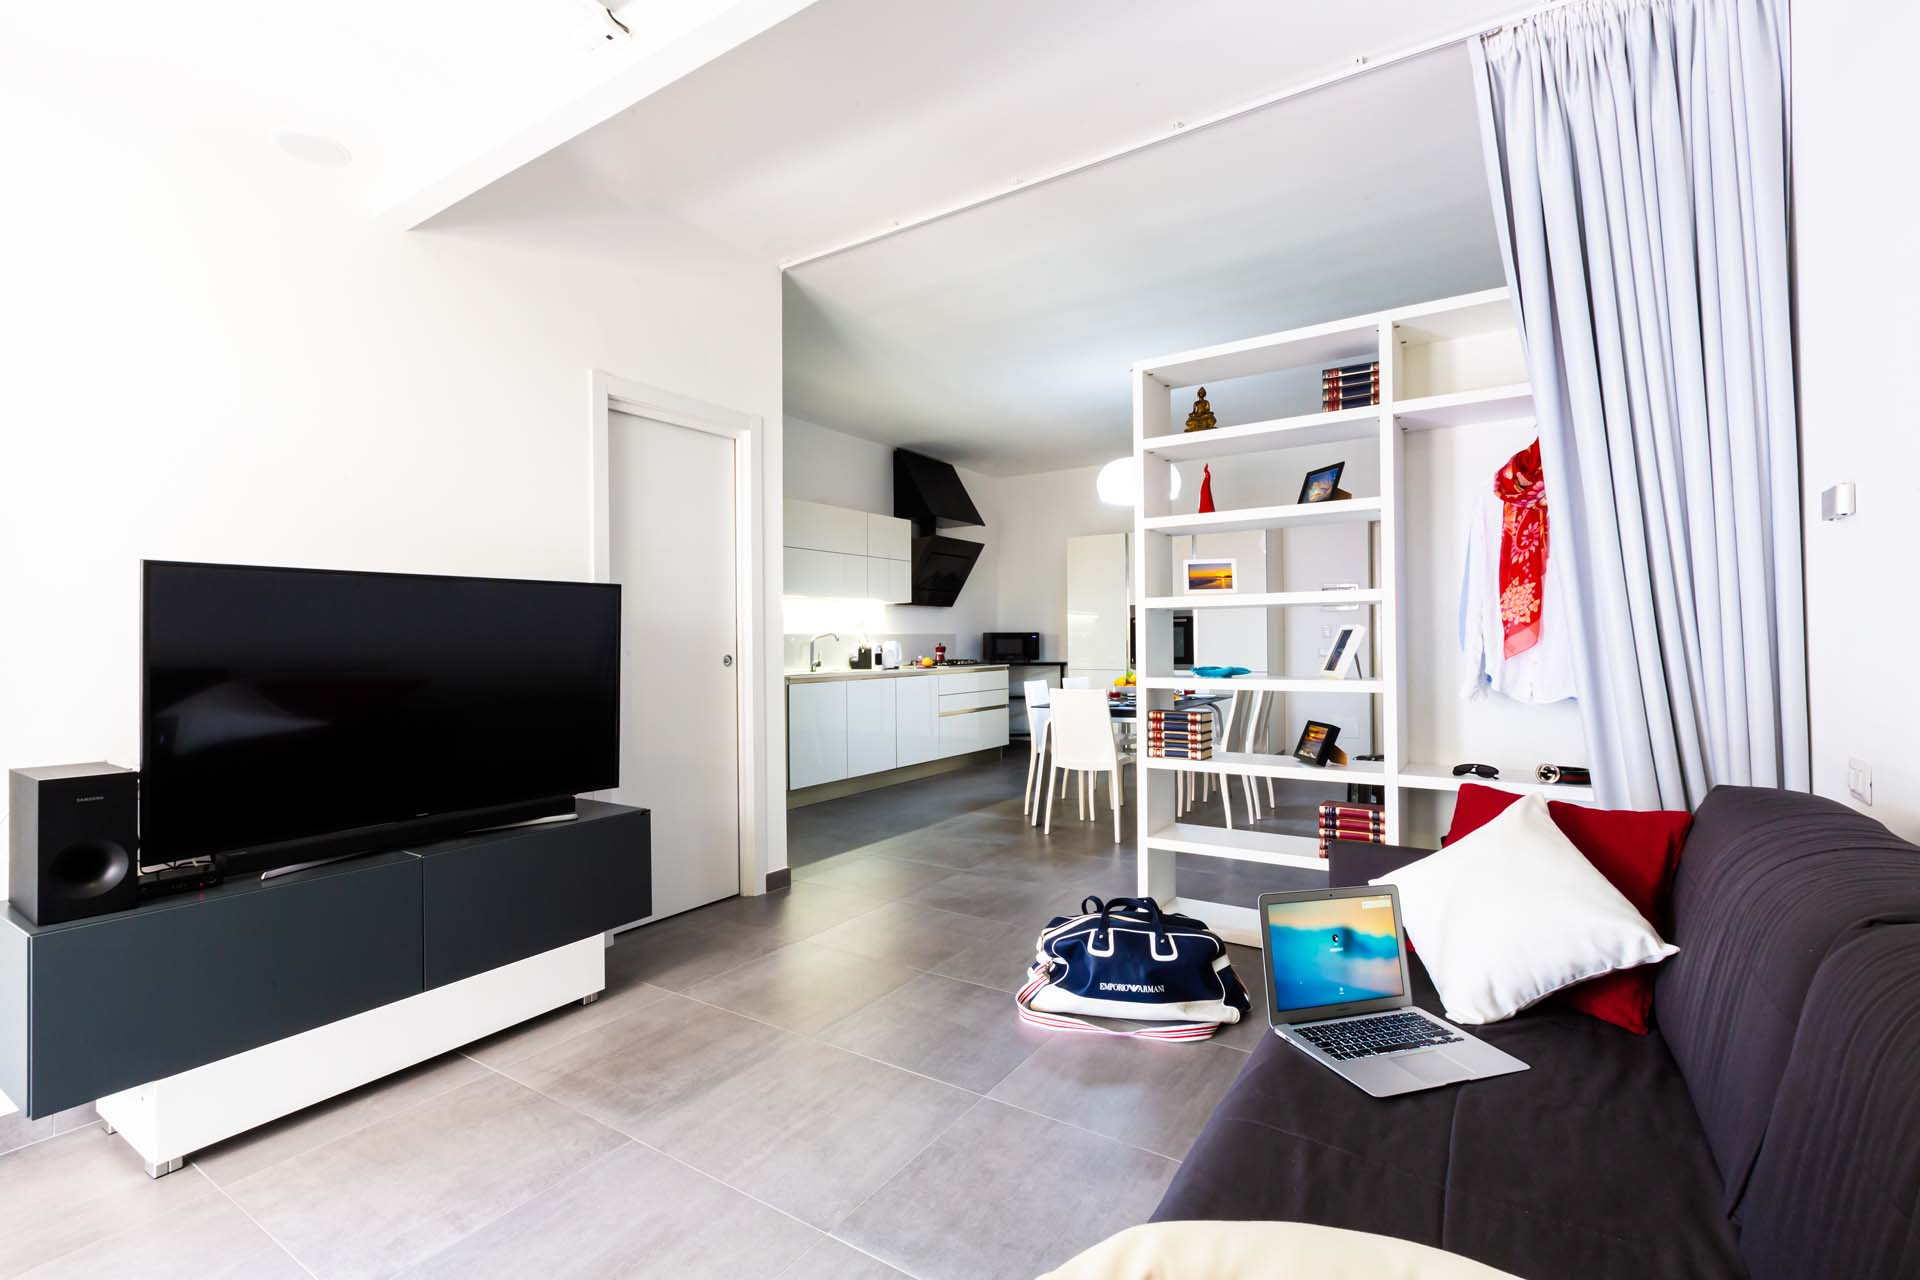 Conny's Luxury Maison Sorrento Apartment